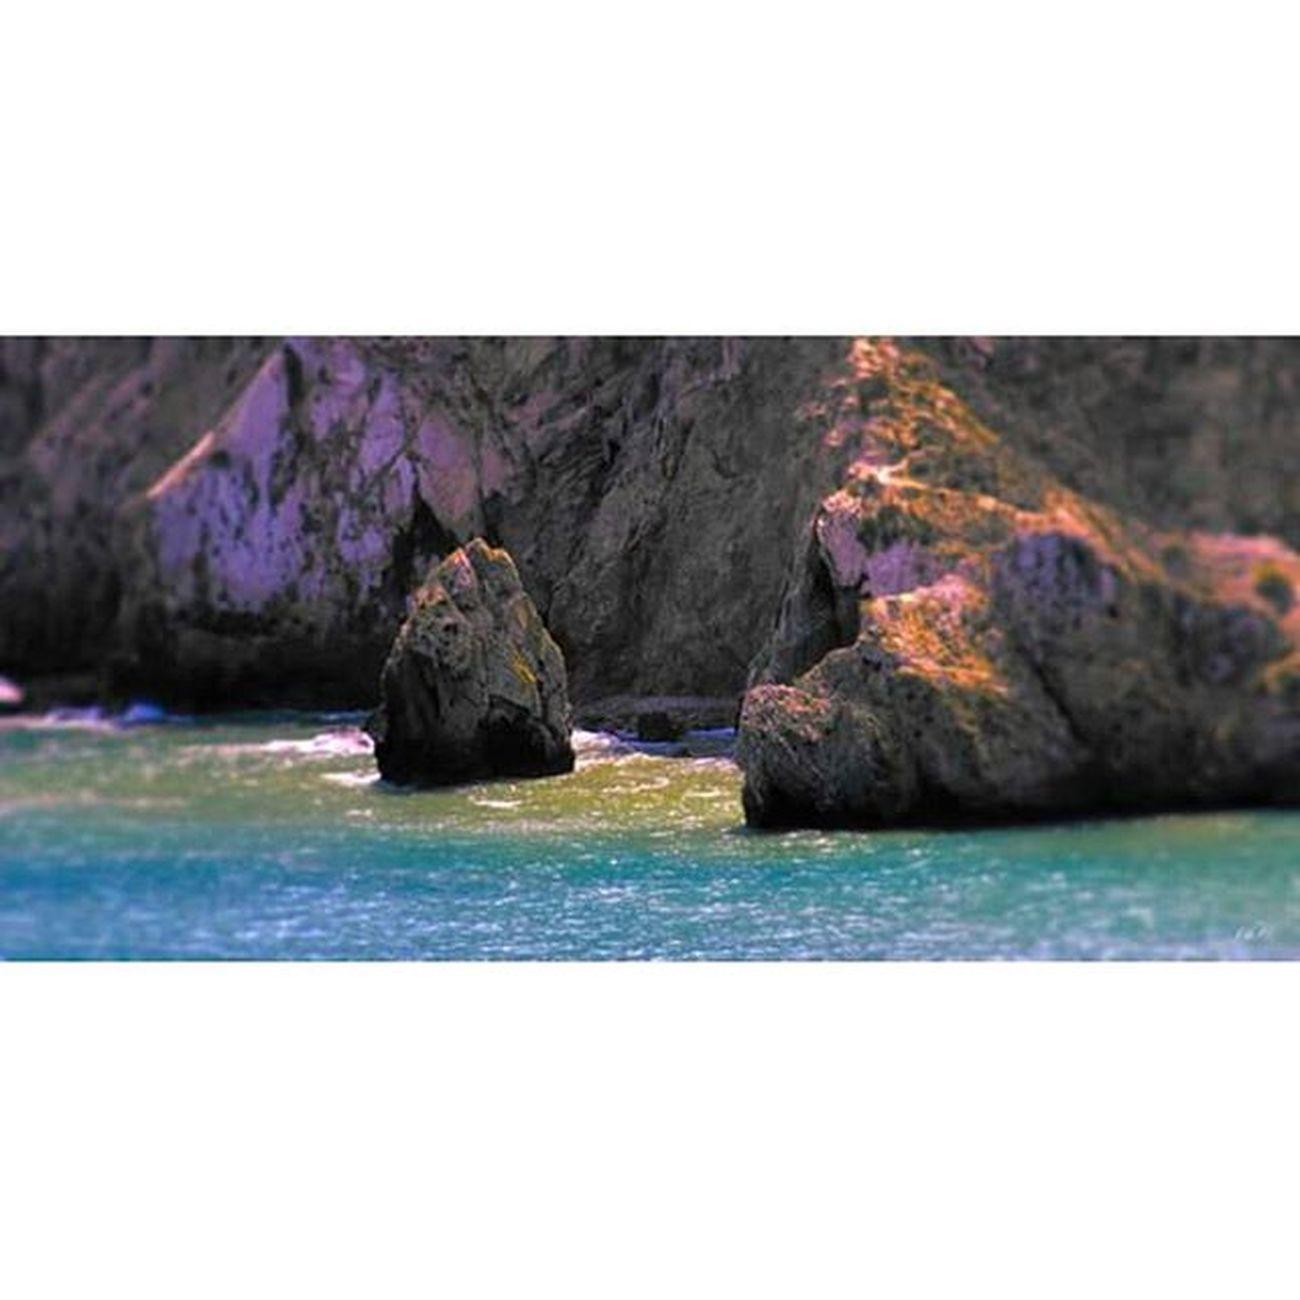 Alhoceima Alhuceima Quemado Rif Mountains Cliff Rocks Falaise Mer Sea Mediterraneansea Mermediterranee Travel Roadtrip Trip Voyage Adventure Aventure Paranoid